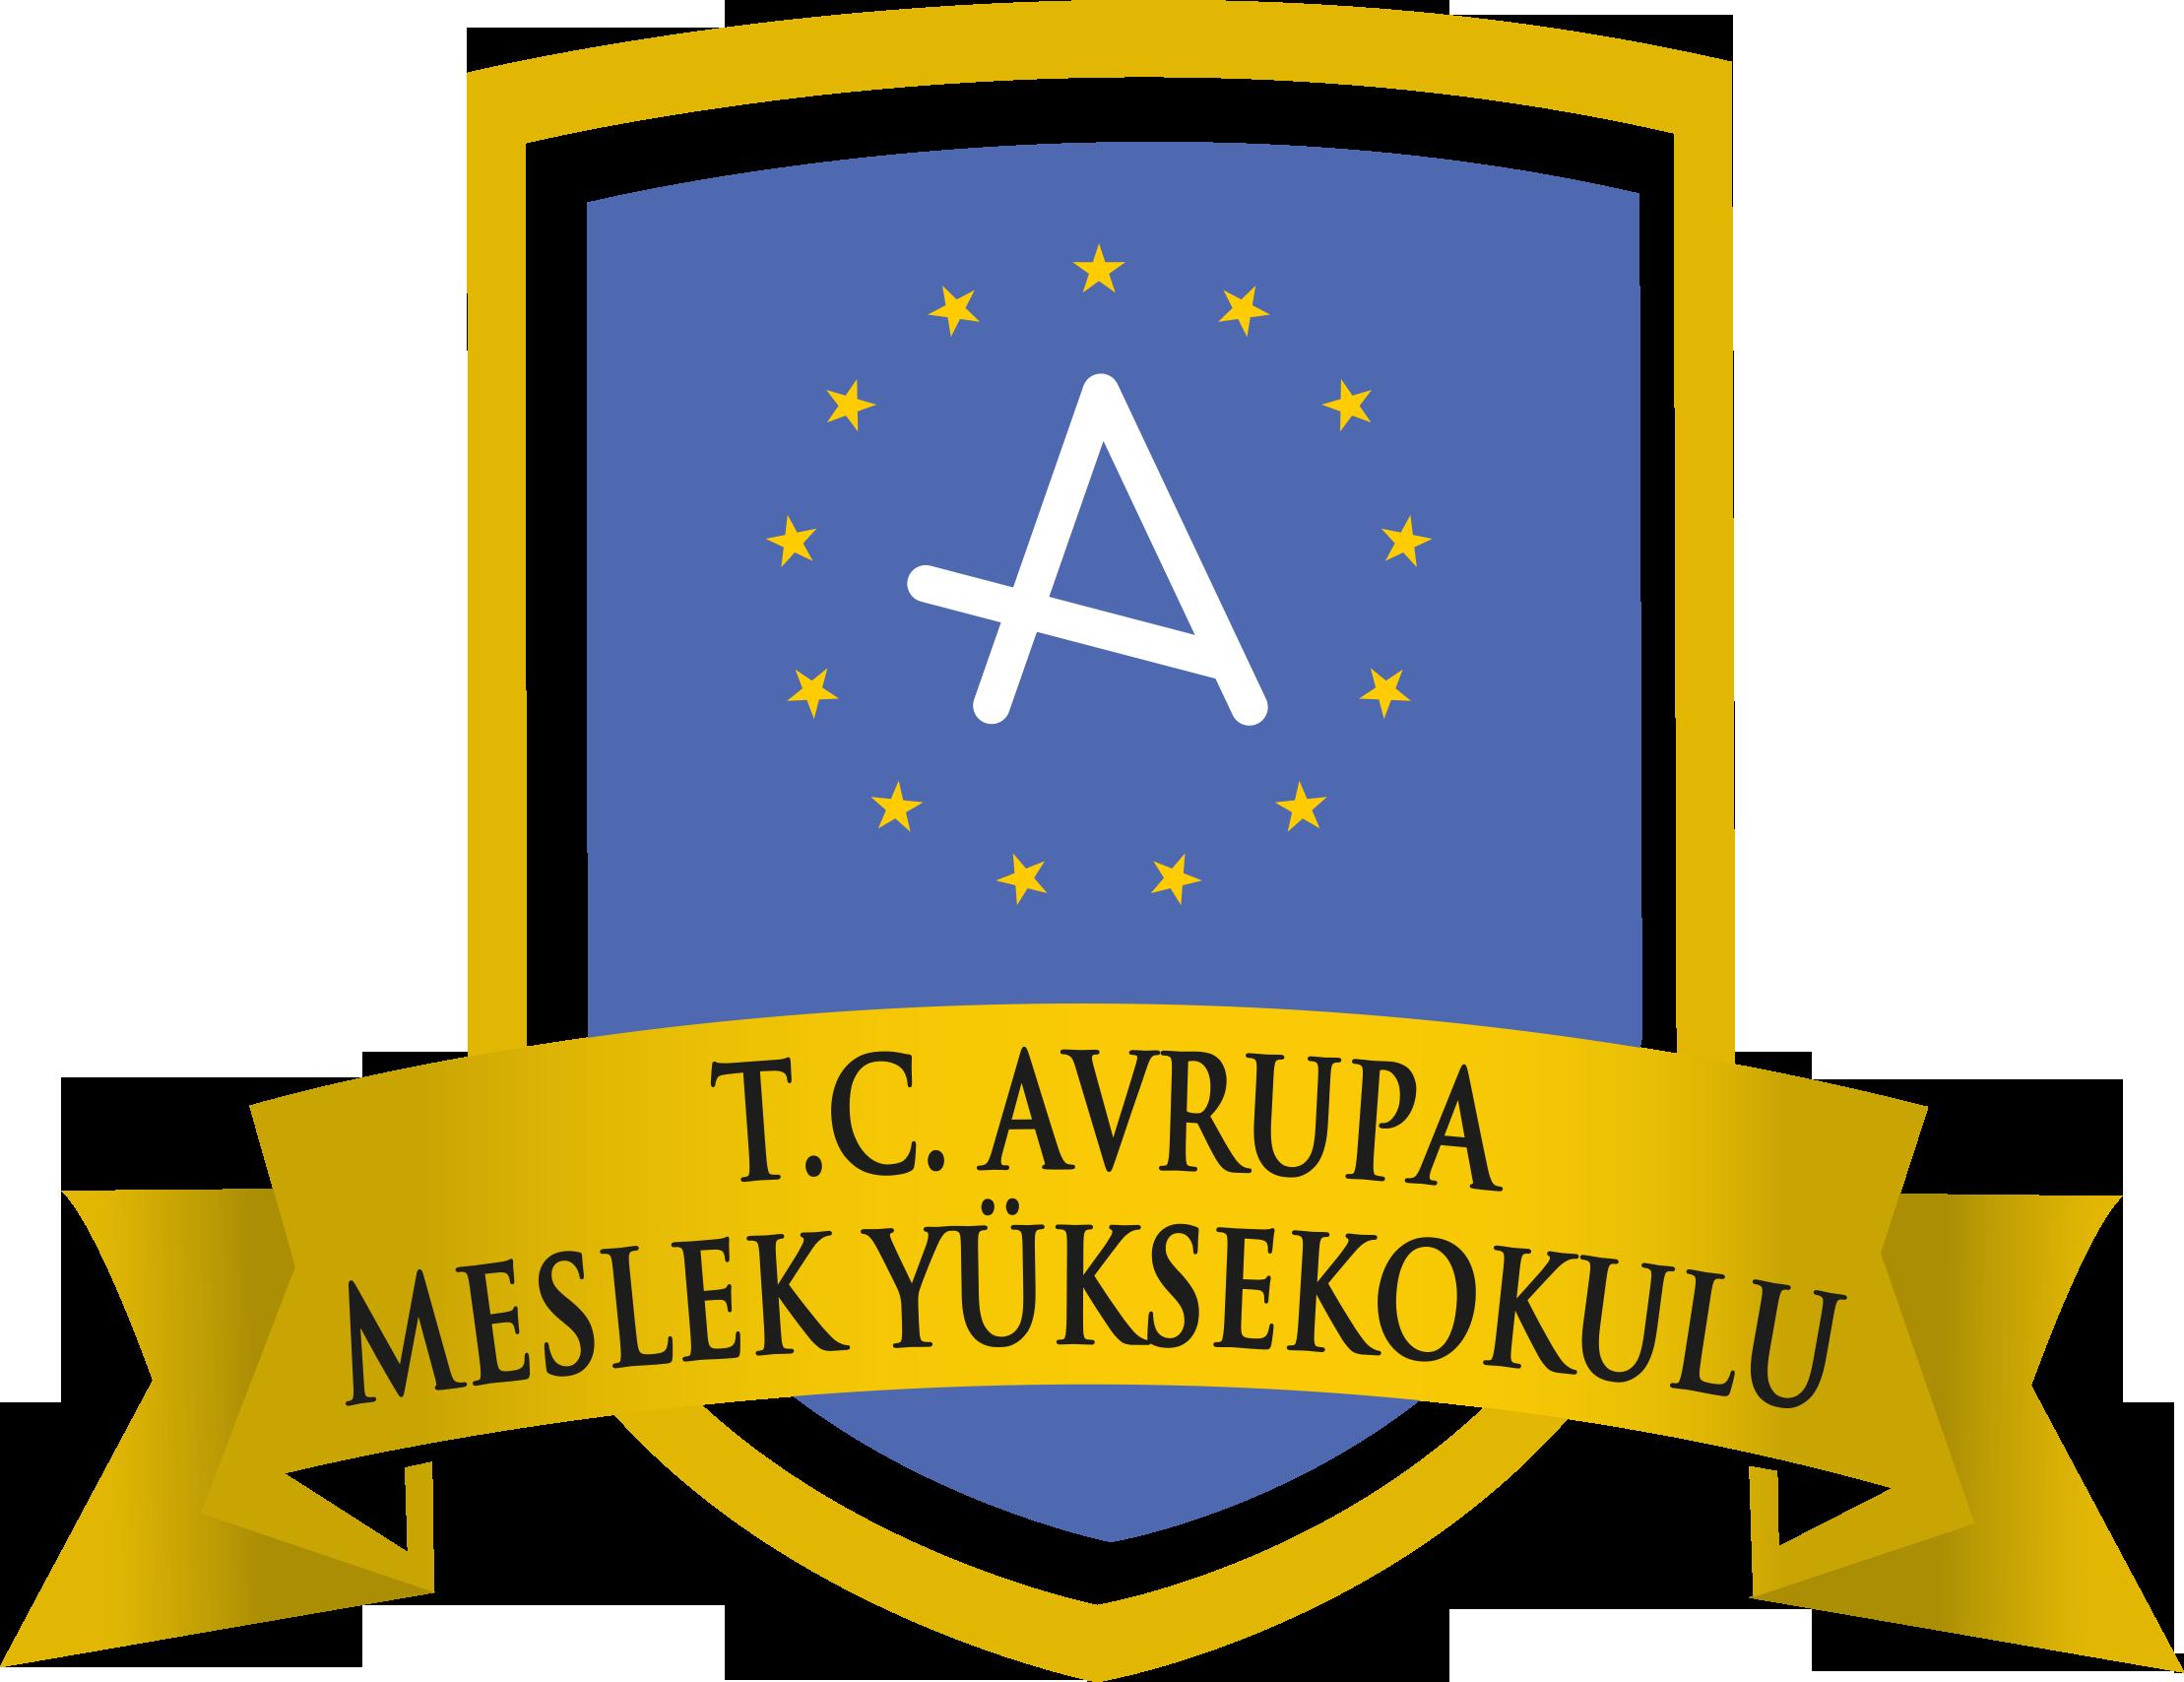 Avrupa Meslek Yüksekokulu